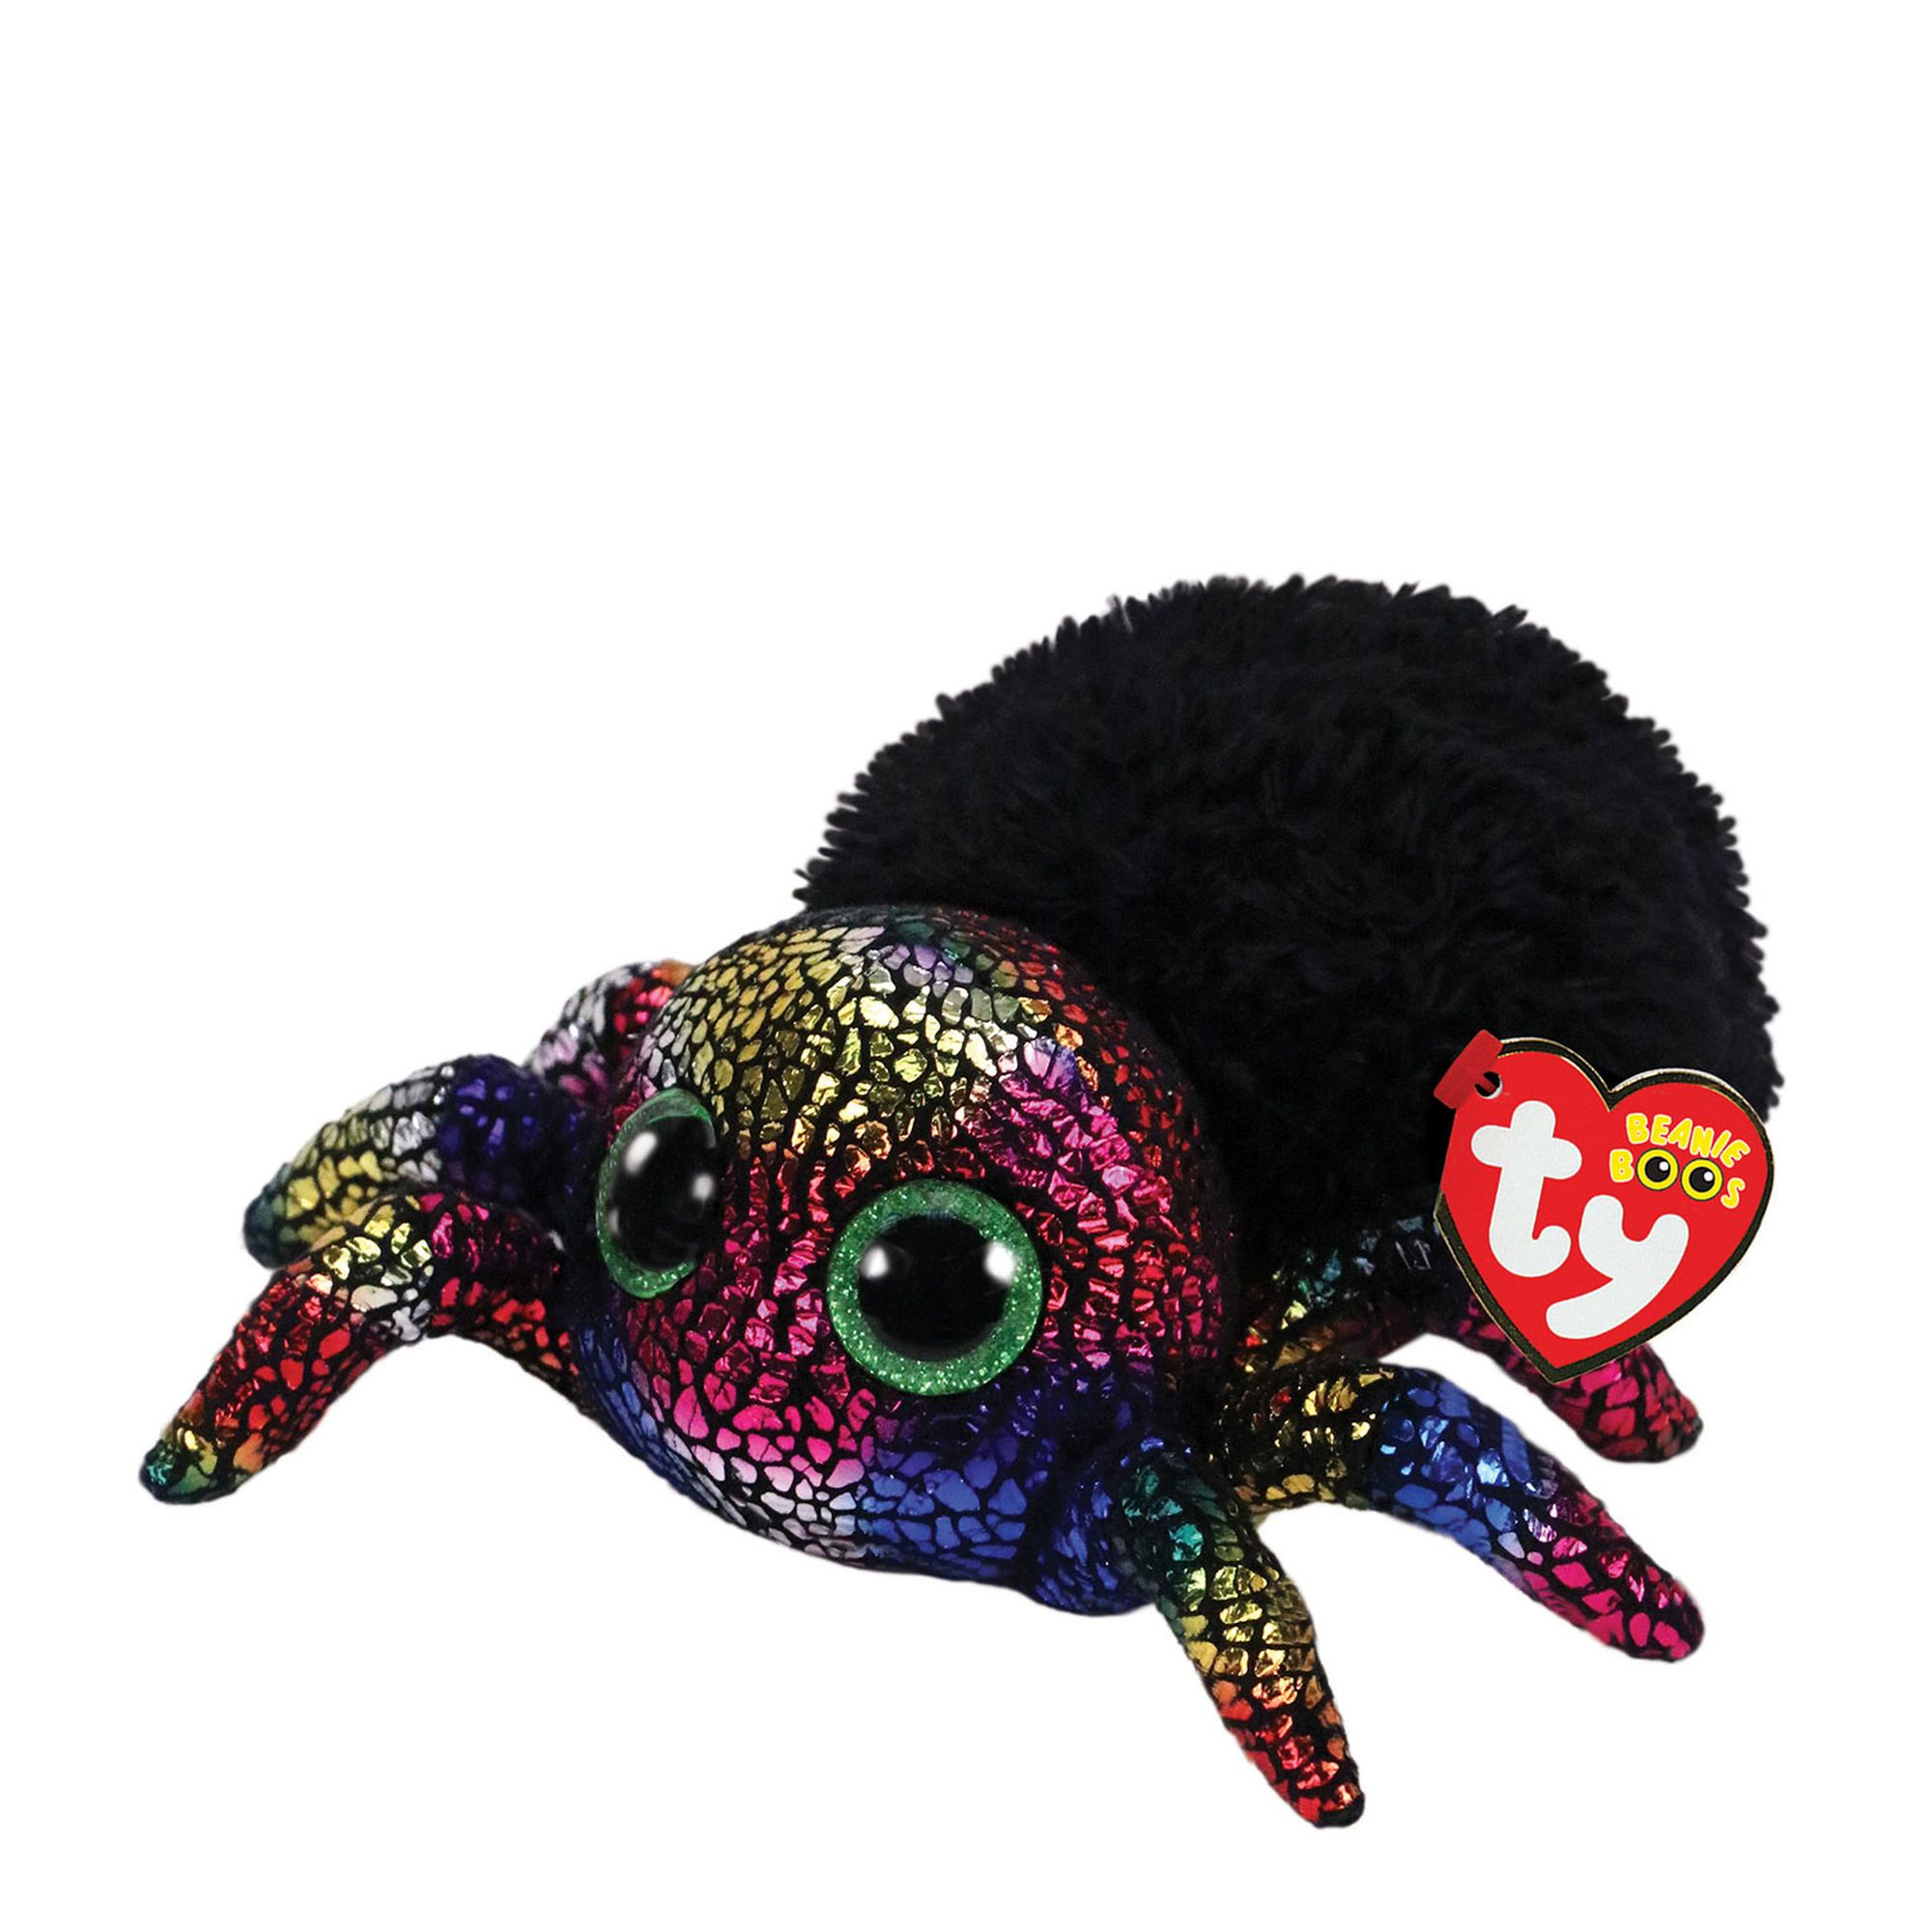 2dcd9539926 Ty Beanie Boo Small Leggz the Spider Plush Toy